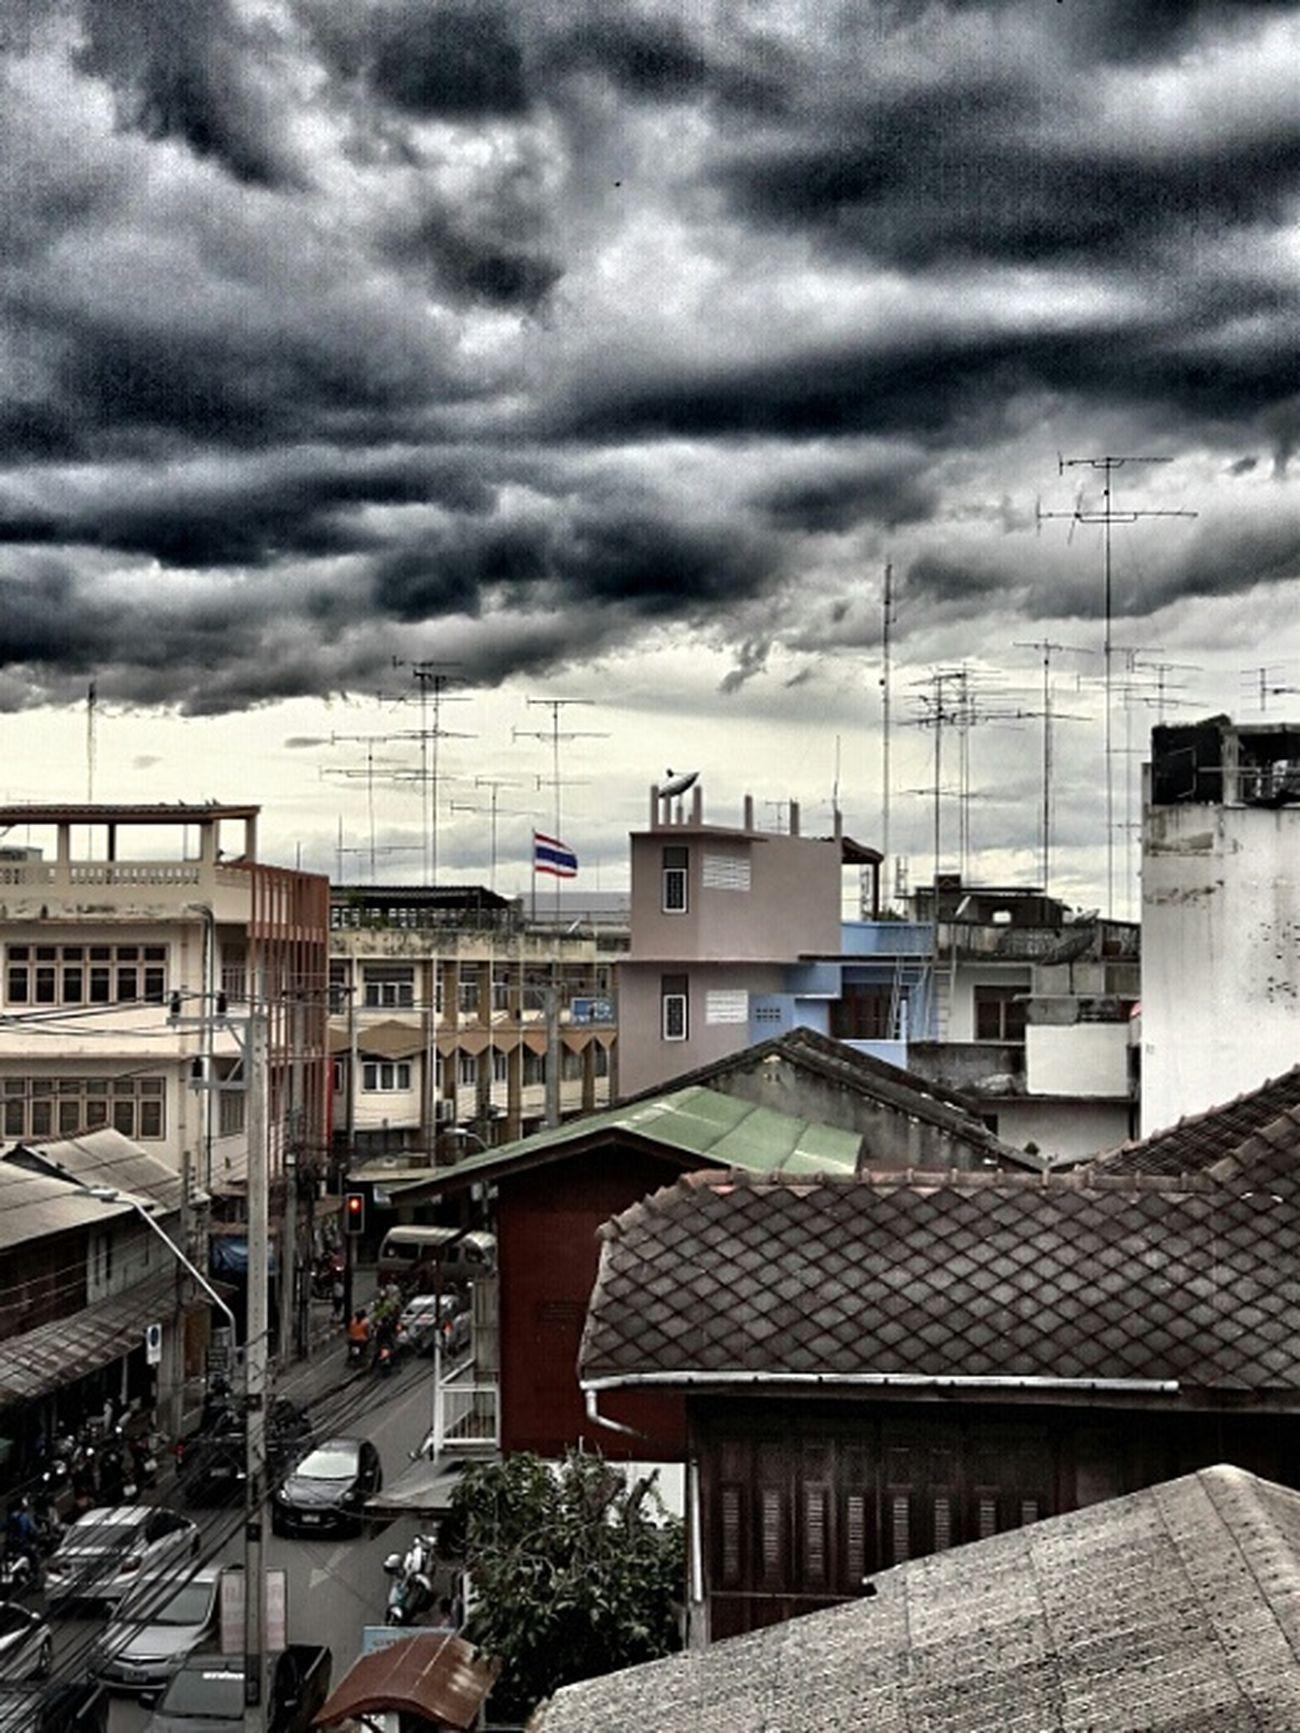 Be very cloudy but not rain. Lifeontheroad Streetphotography Rain Eyeemthailand Rainyseason Sky And Clouds Edited Skylovers